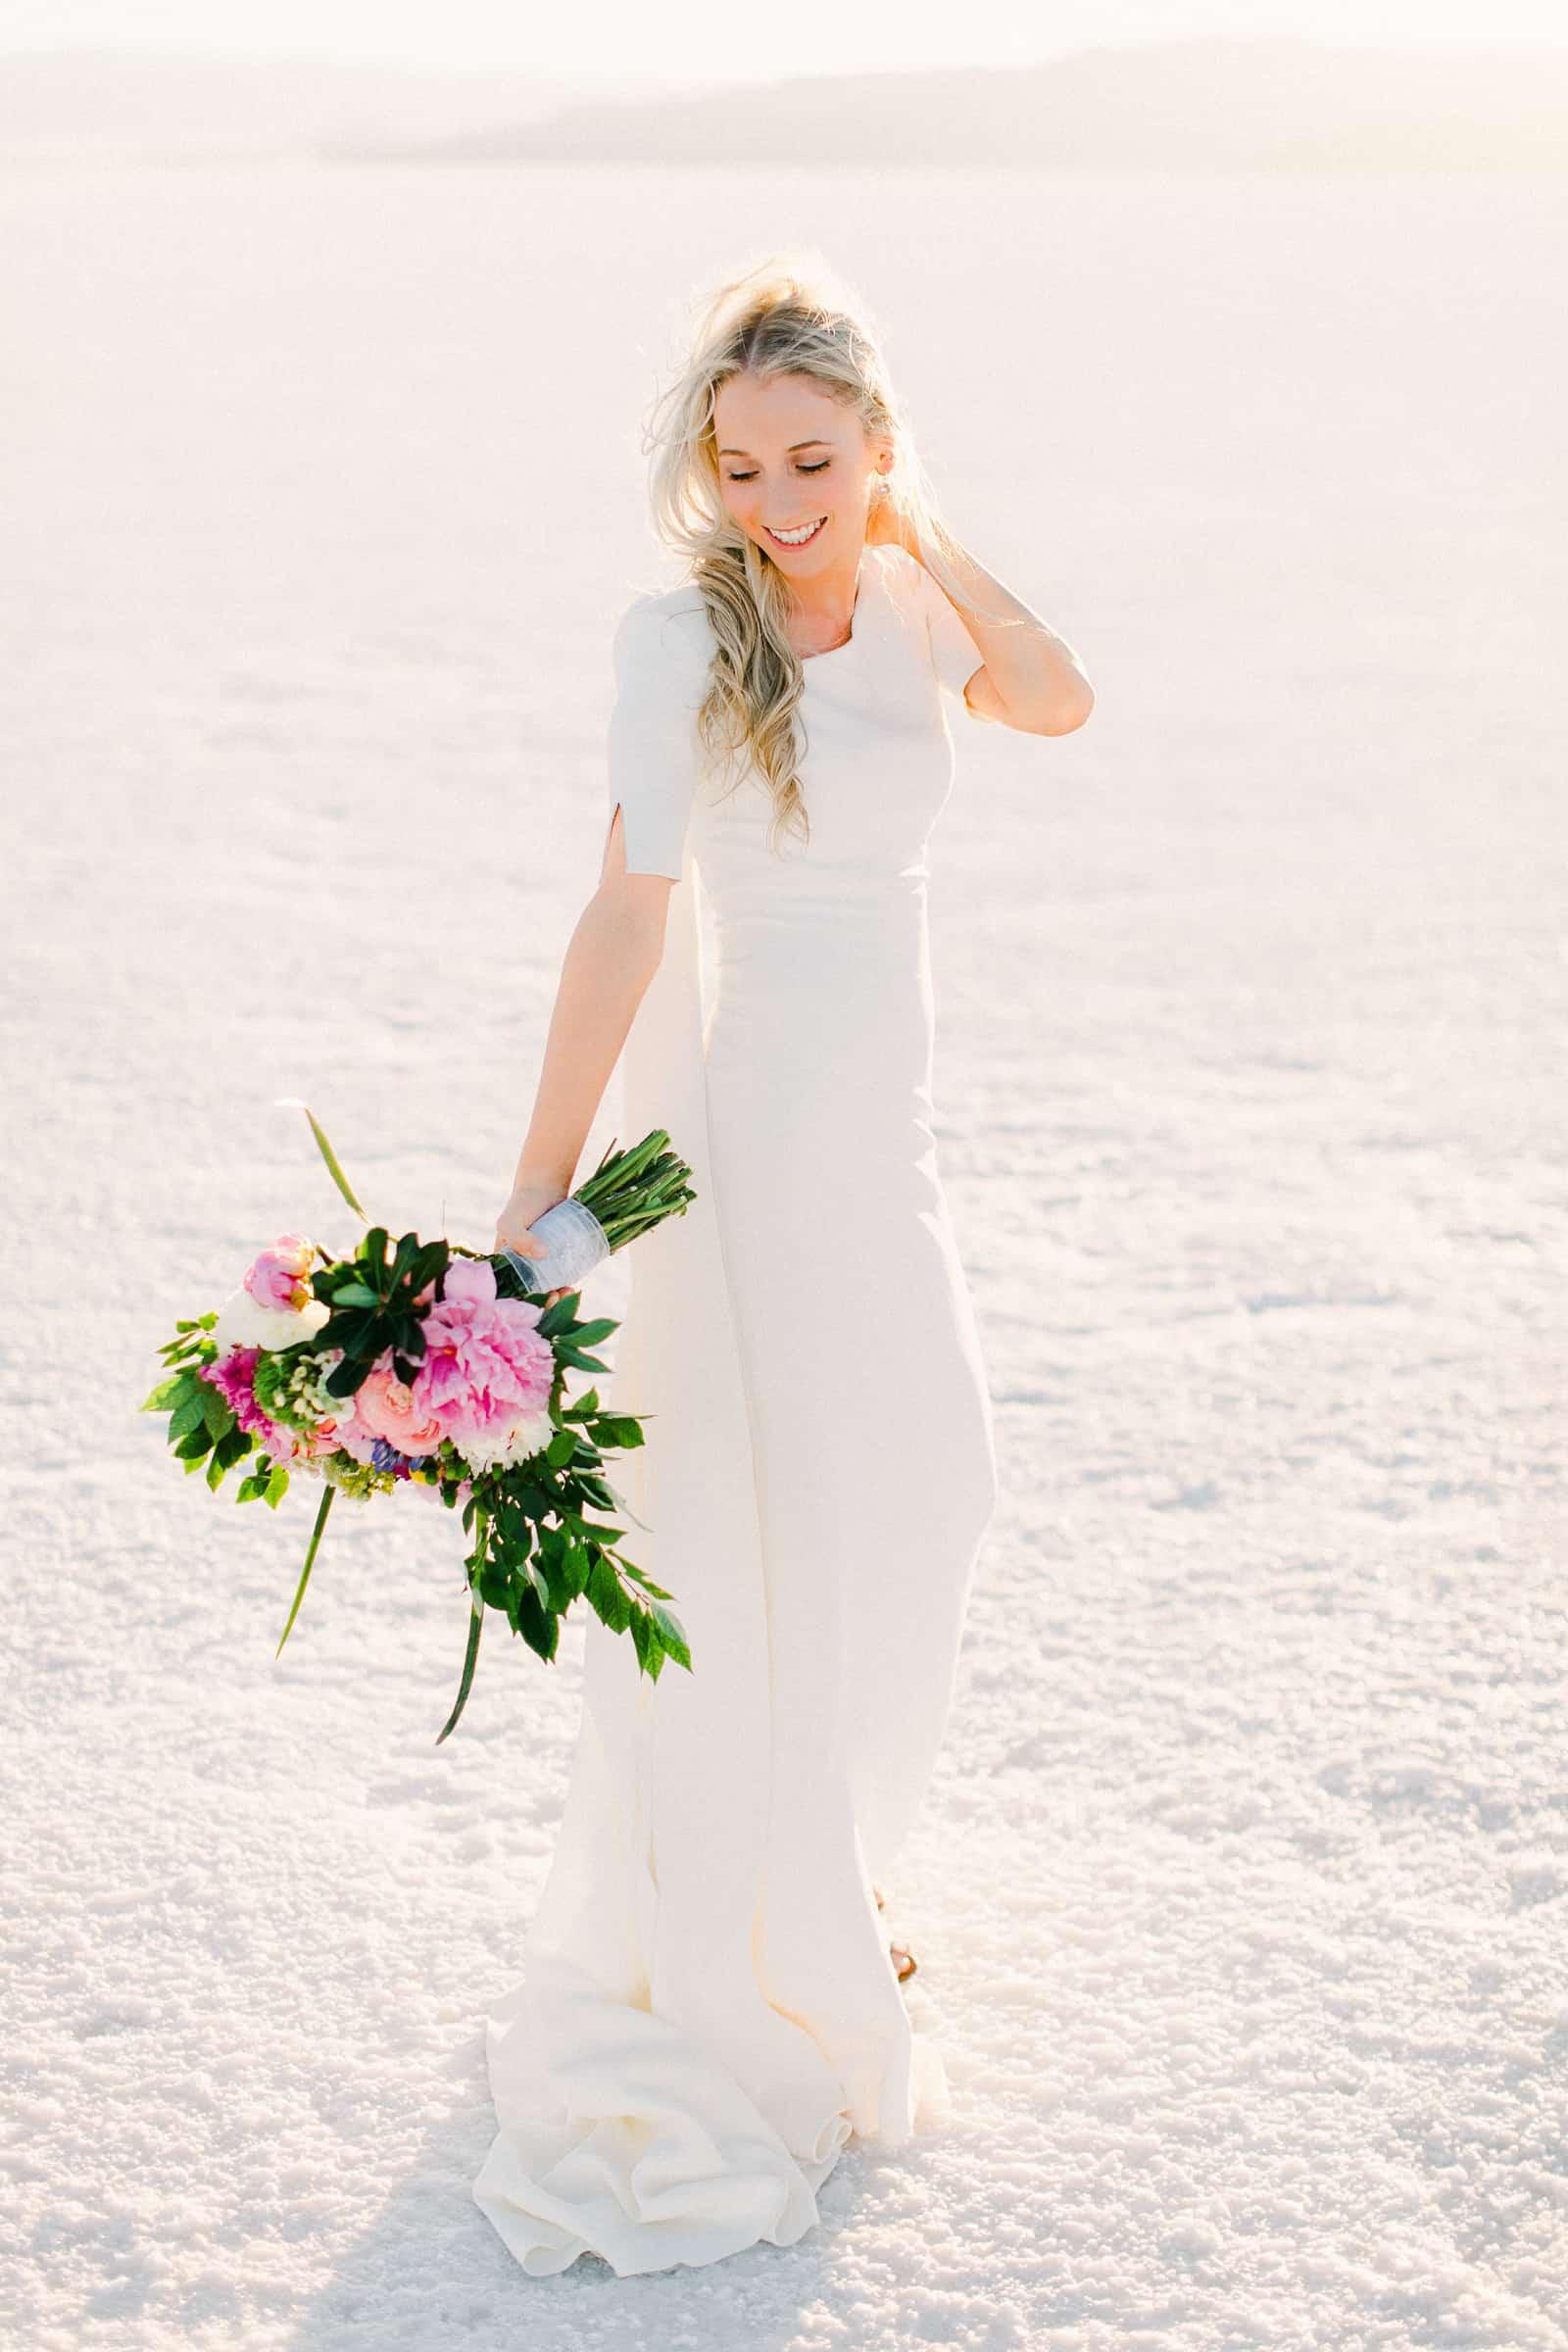 Bonneville Salt Flats Utah Wedding Photography, destination wedding, bride in modern simple white wedding dress, boho bride